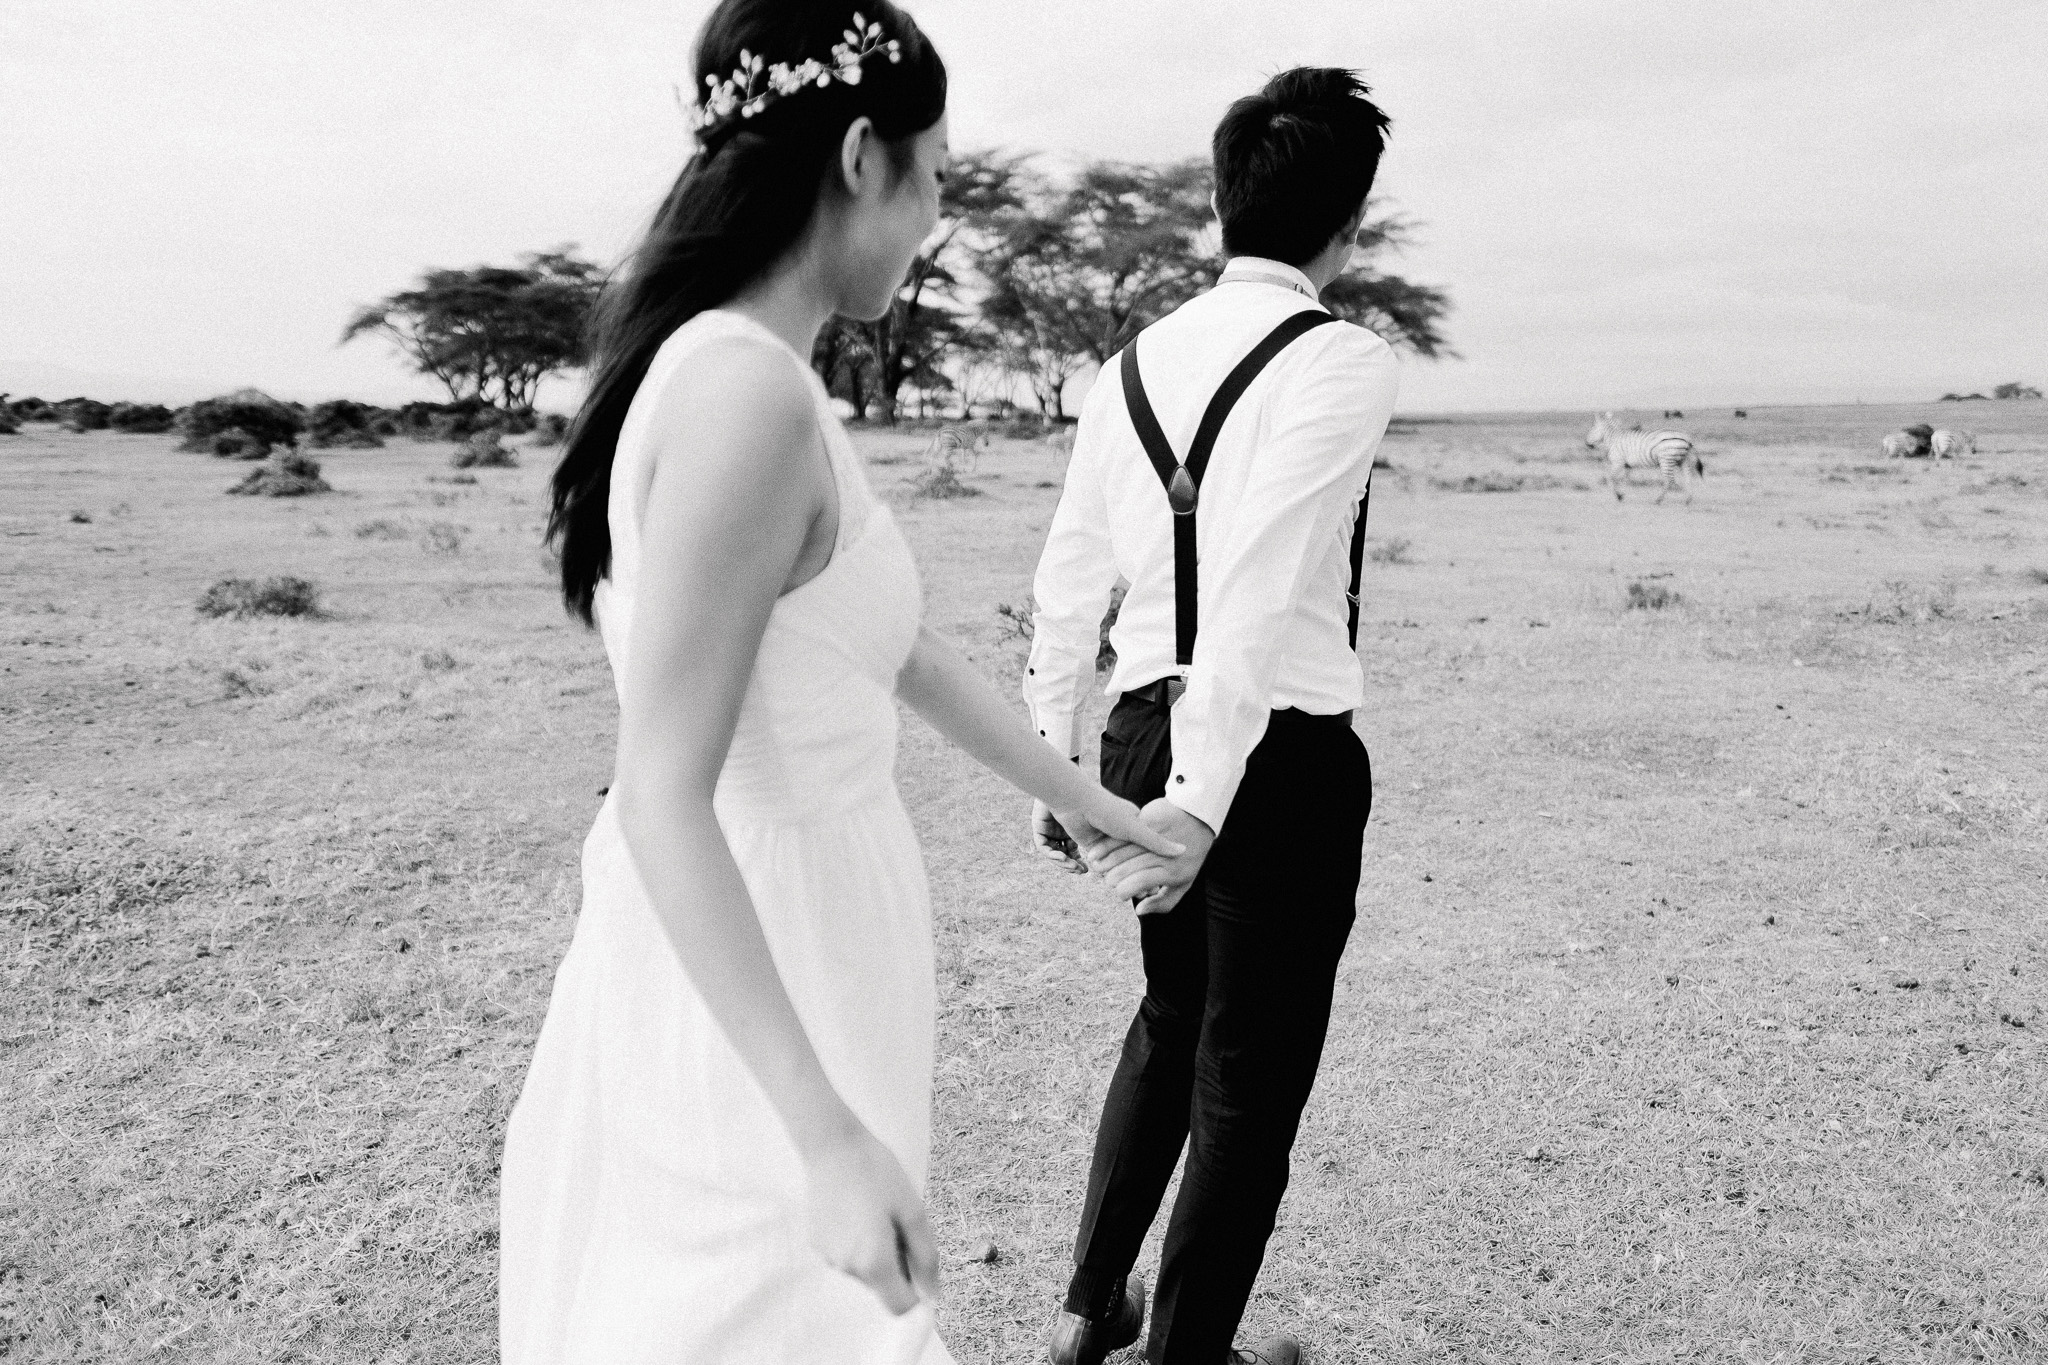 Anna-Hari-Photography-Safari-Elopement-Kenya-Wedding-Photographer-Kenya-19.jpg